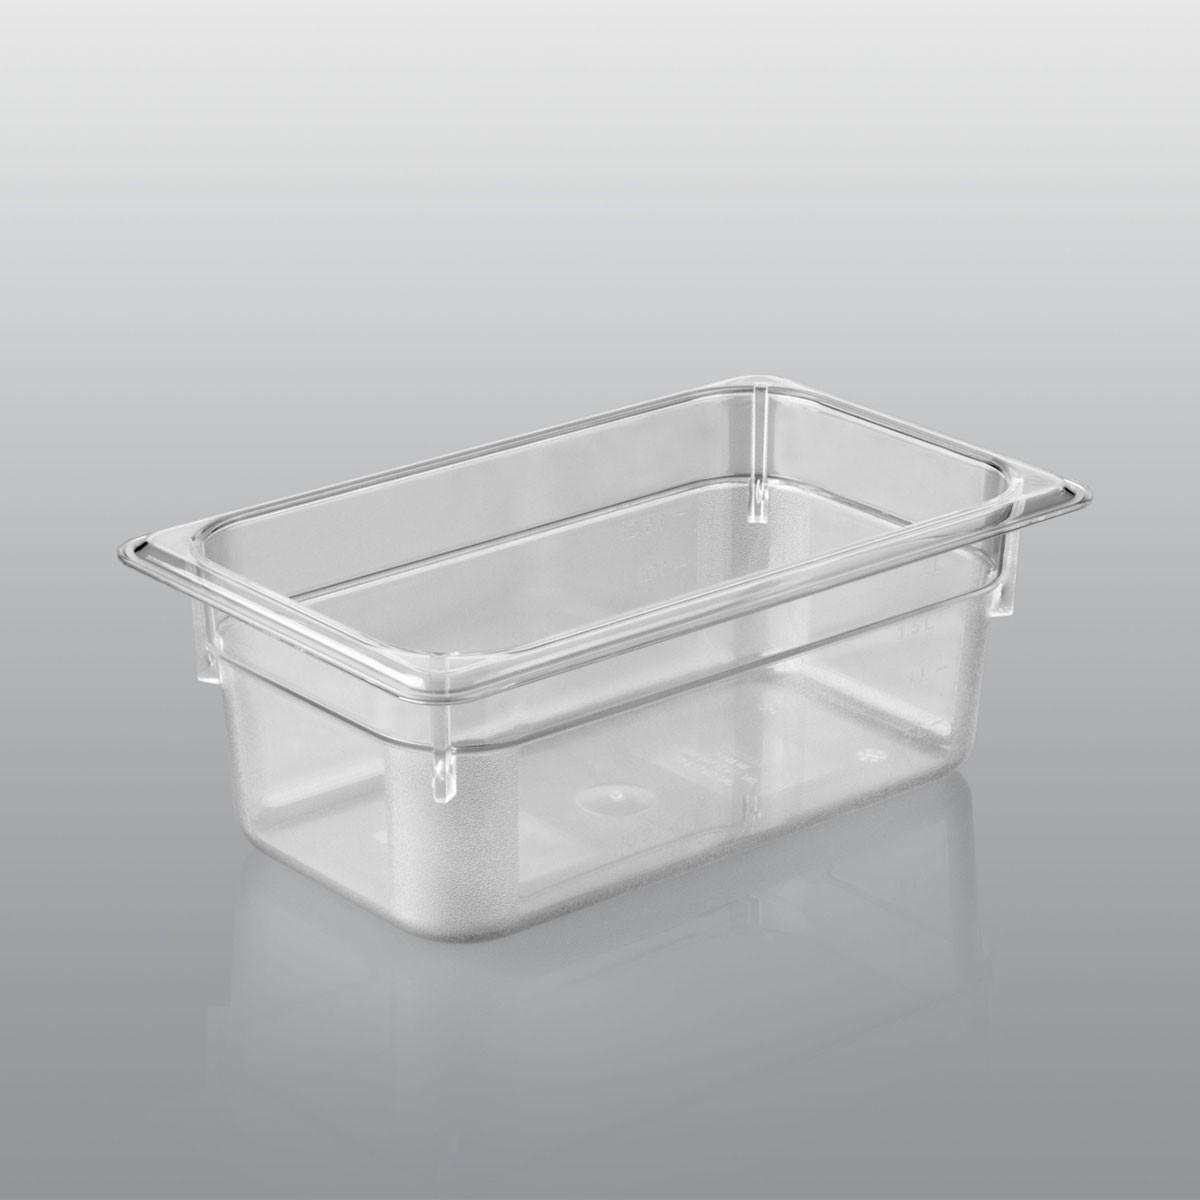 GN Behälter GN 1/4 aus Polycarbonat (Tiefe: 65mm) 1,8 L Saro